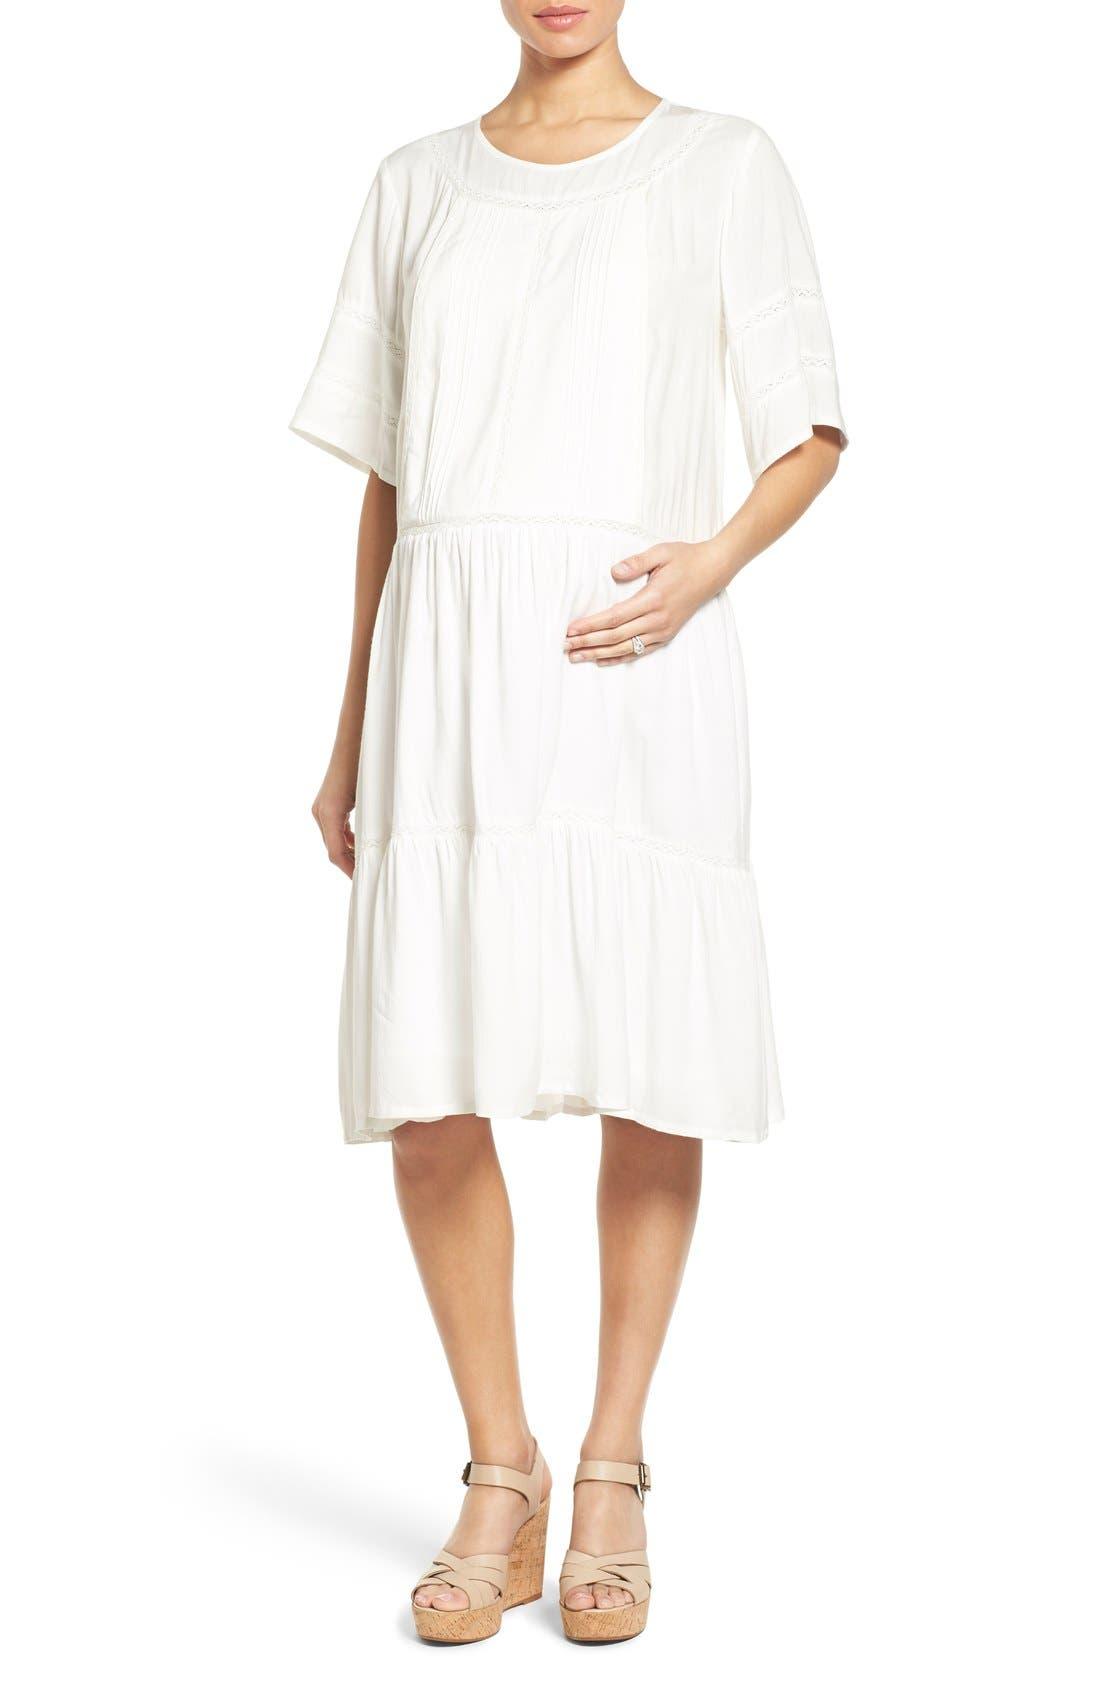 'Wild at Heart' Maternity/Nursing Midi Dress,                             Main thumbnail 1, color,                             900